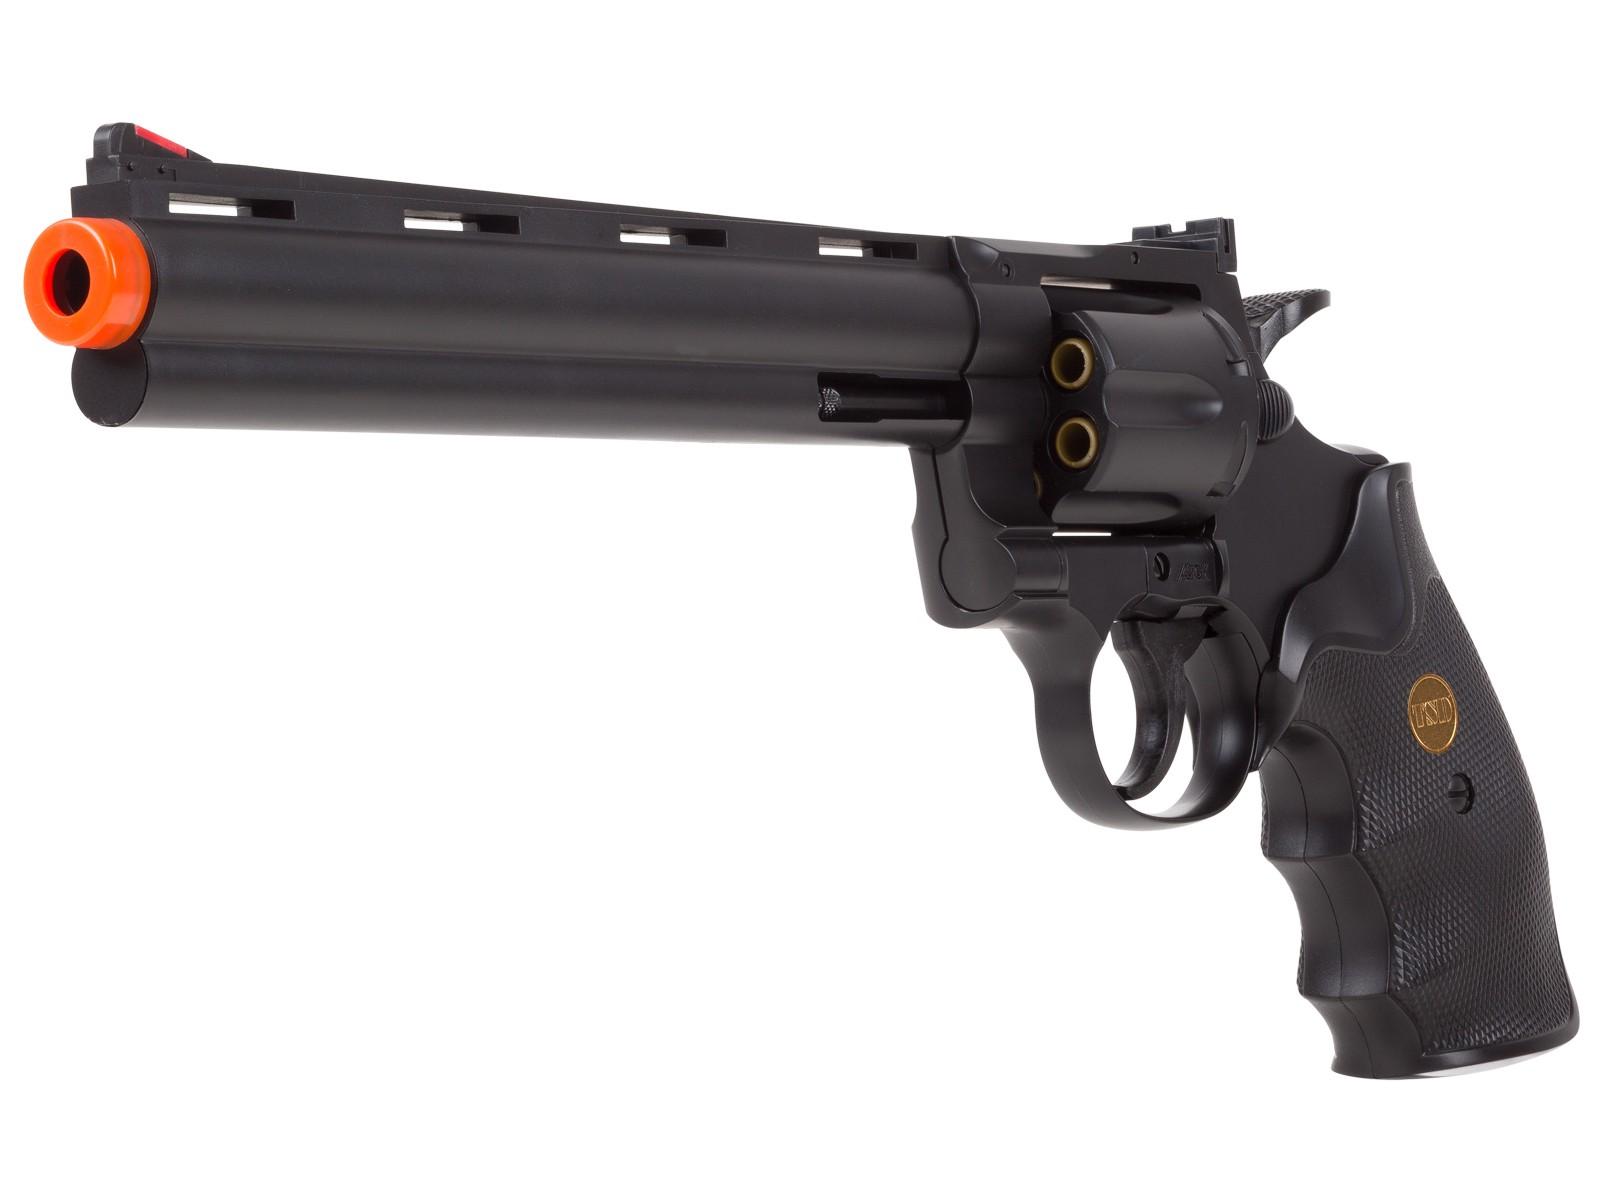 TSD_941_UHC_8_inch_revolver_Black_6mm